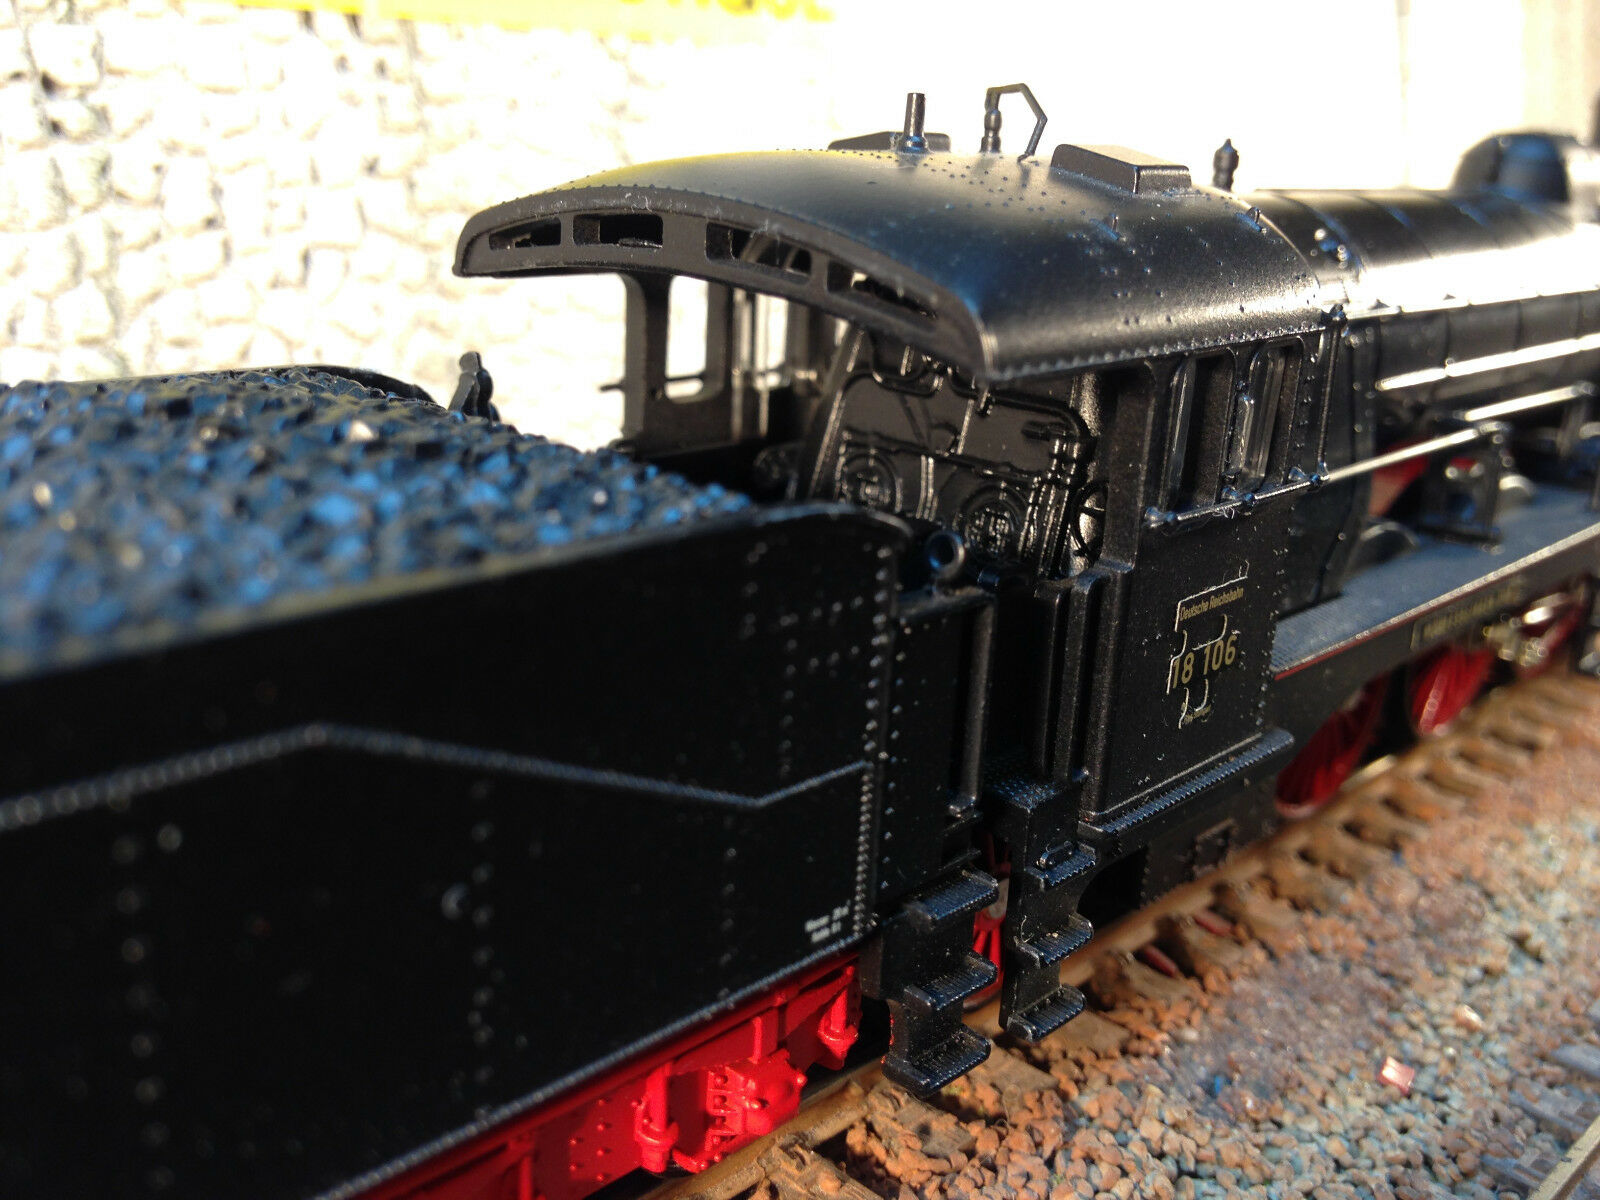 Marklin 33513 HO - Locomotive type 231 BR 18.1 ep ep ep II DR (18106 - Stutgart) DELTA ba287c